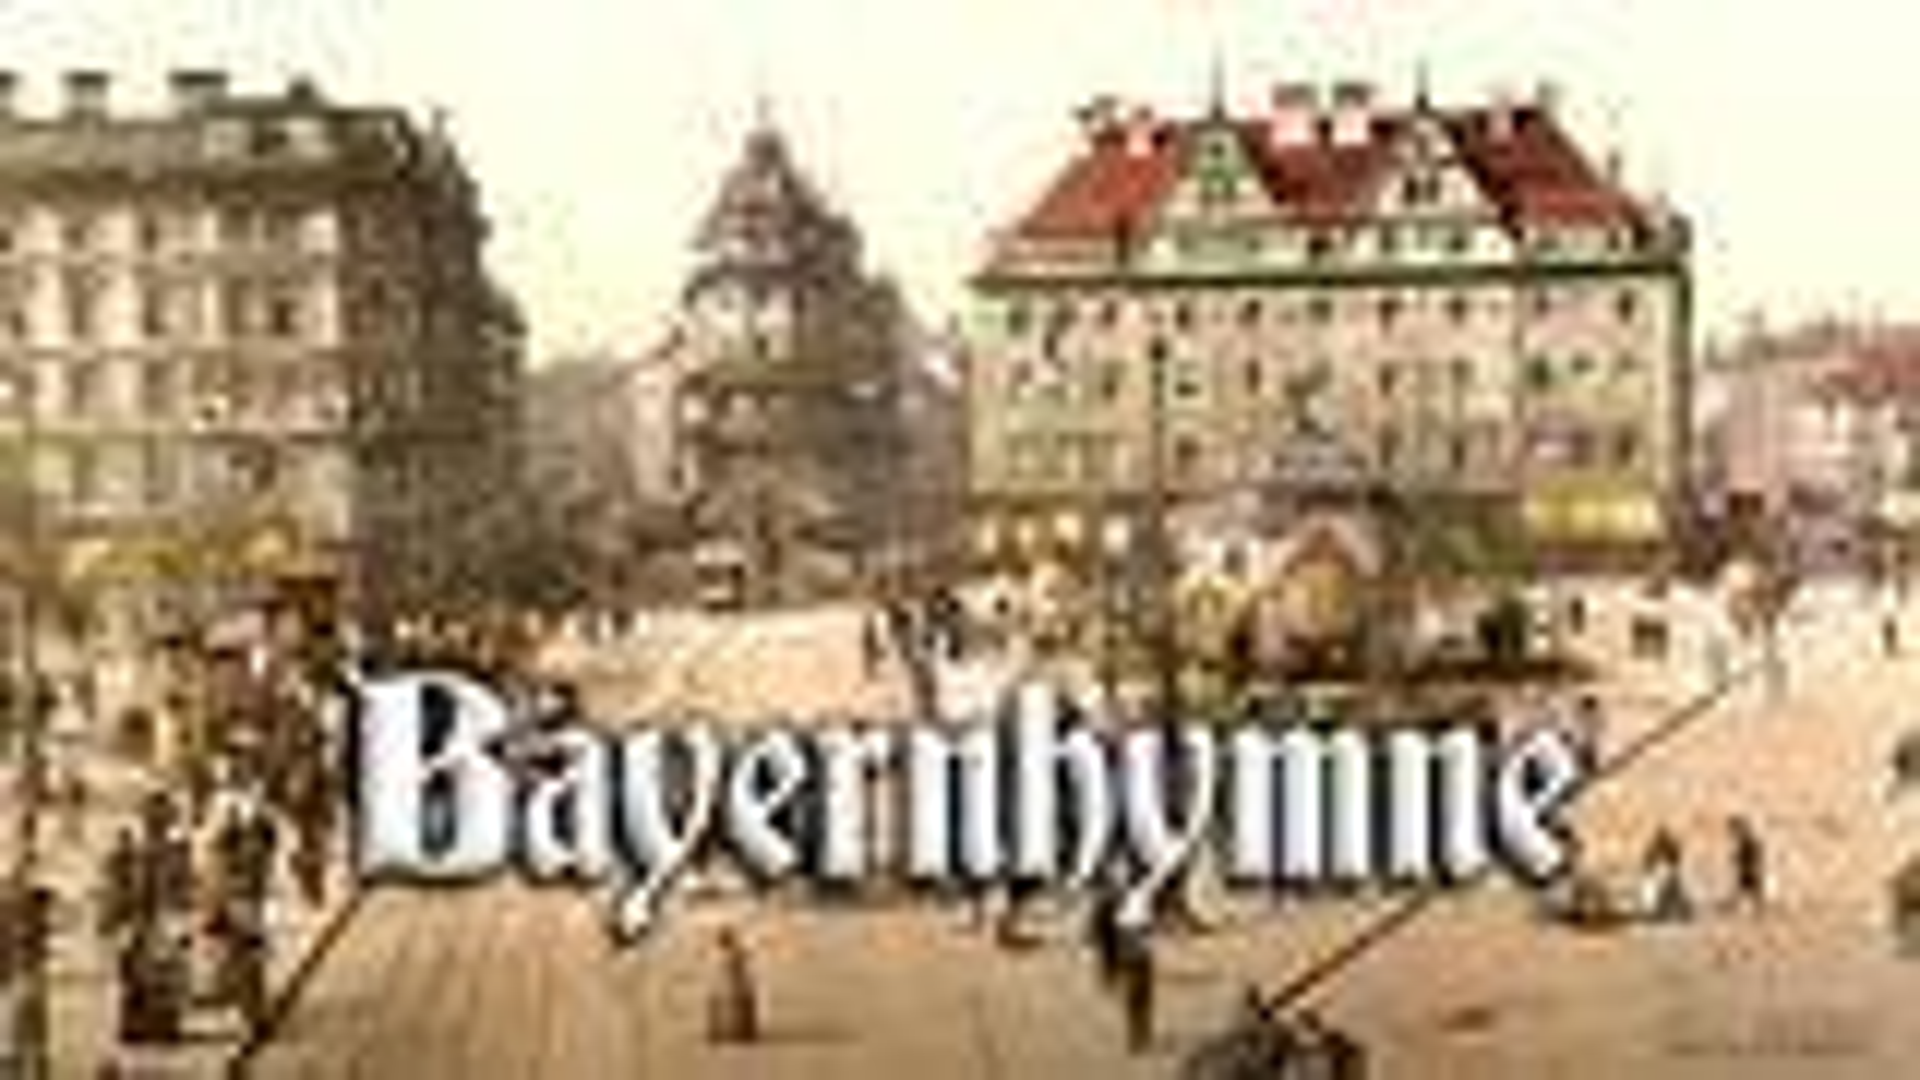 Bayernhymne[巴伐利亚颂][巴伐利亚州歌][乐器版]